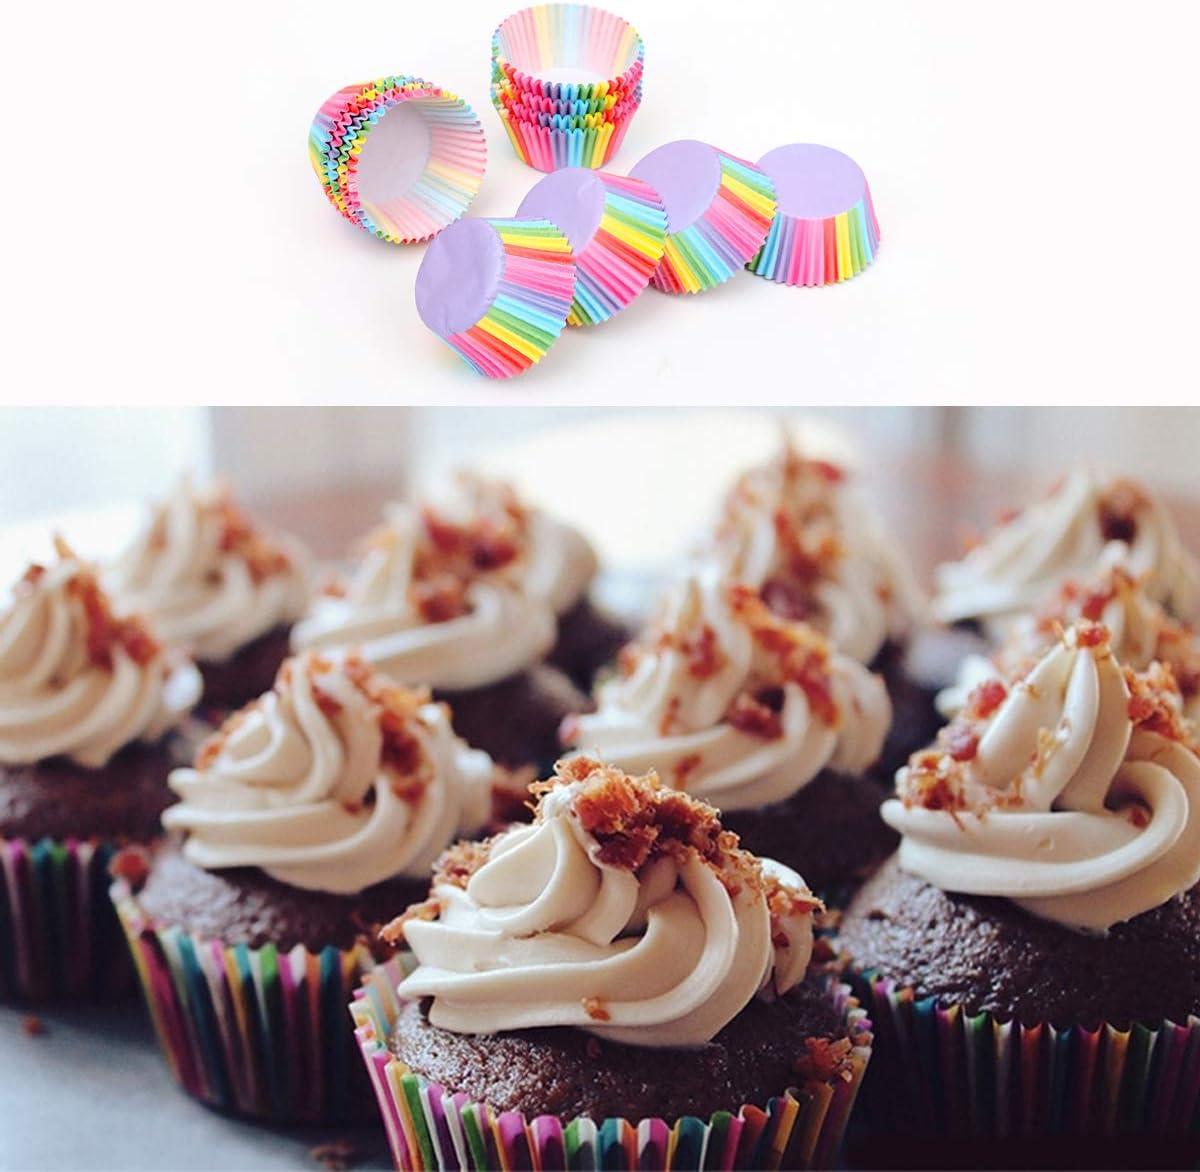 Arco/íris Moldes de Papel para Magdalenas Cumplea/ños Bodas Fiesta 400 Papel para Cupcakes Cupcakes de Papel para Navidad Fiesta de Acci/ón de Gracias Rainbow Papel para Magdalenas Muffins